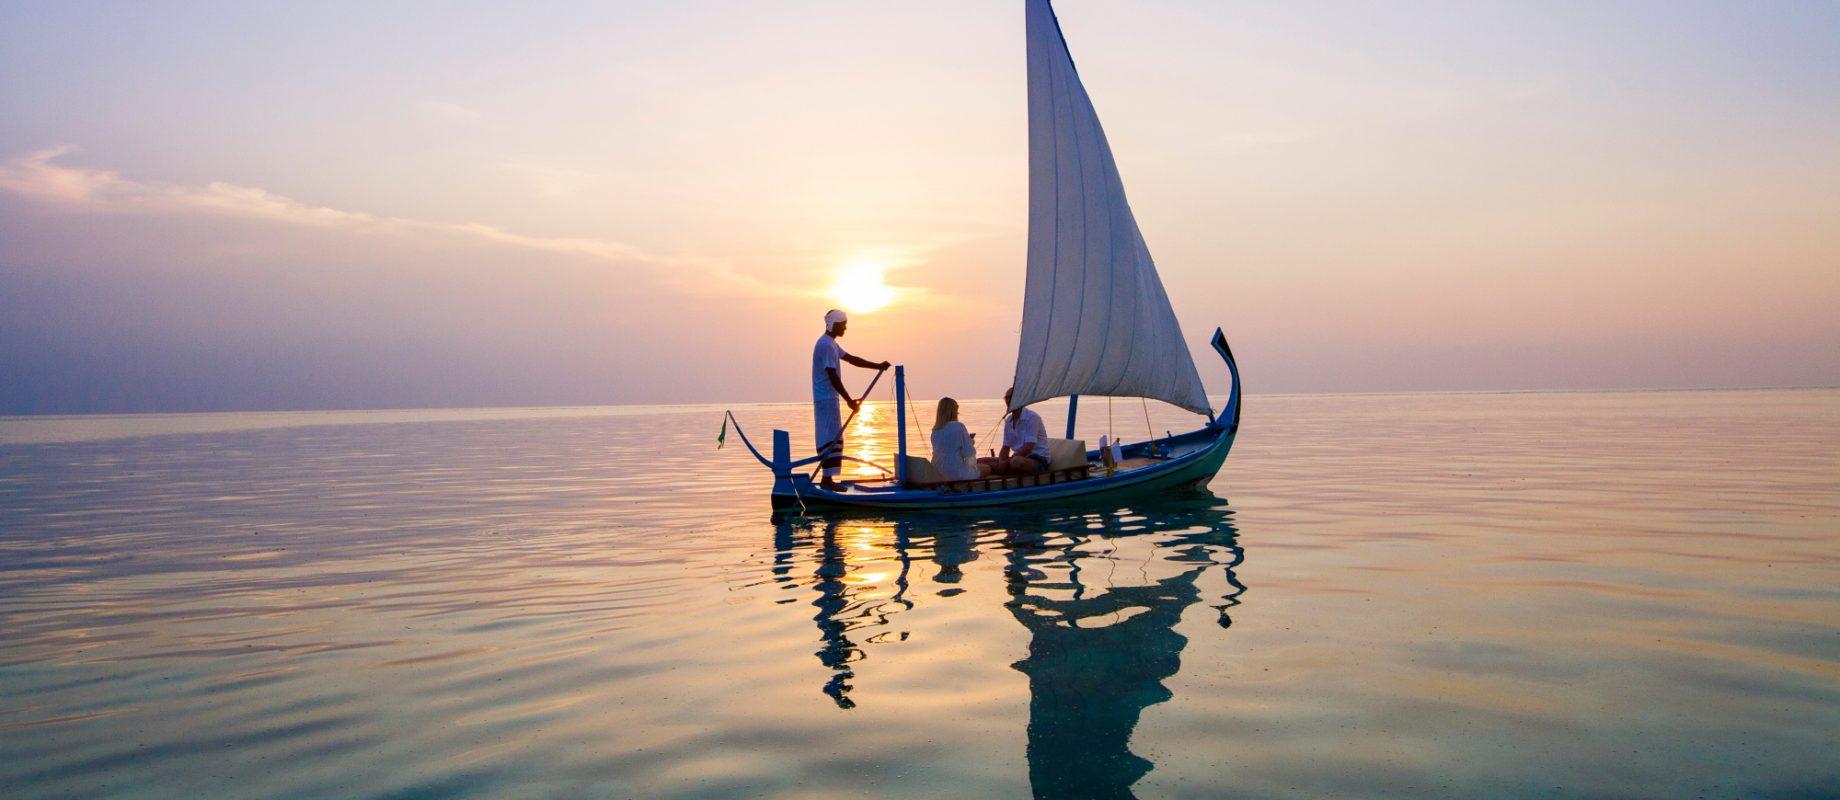 South Asia's Leading Beach Resort